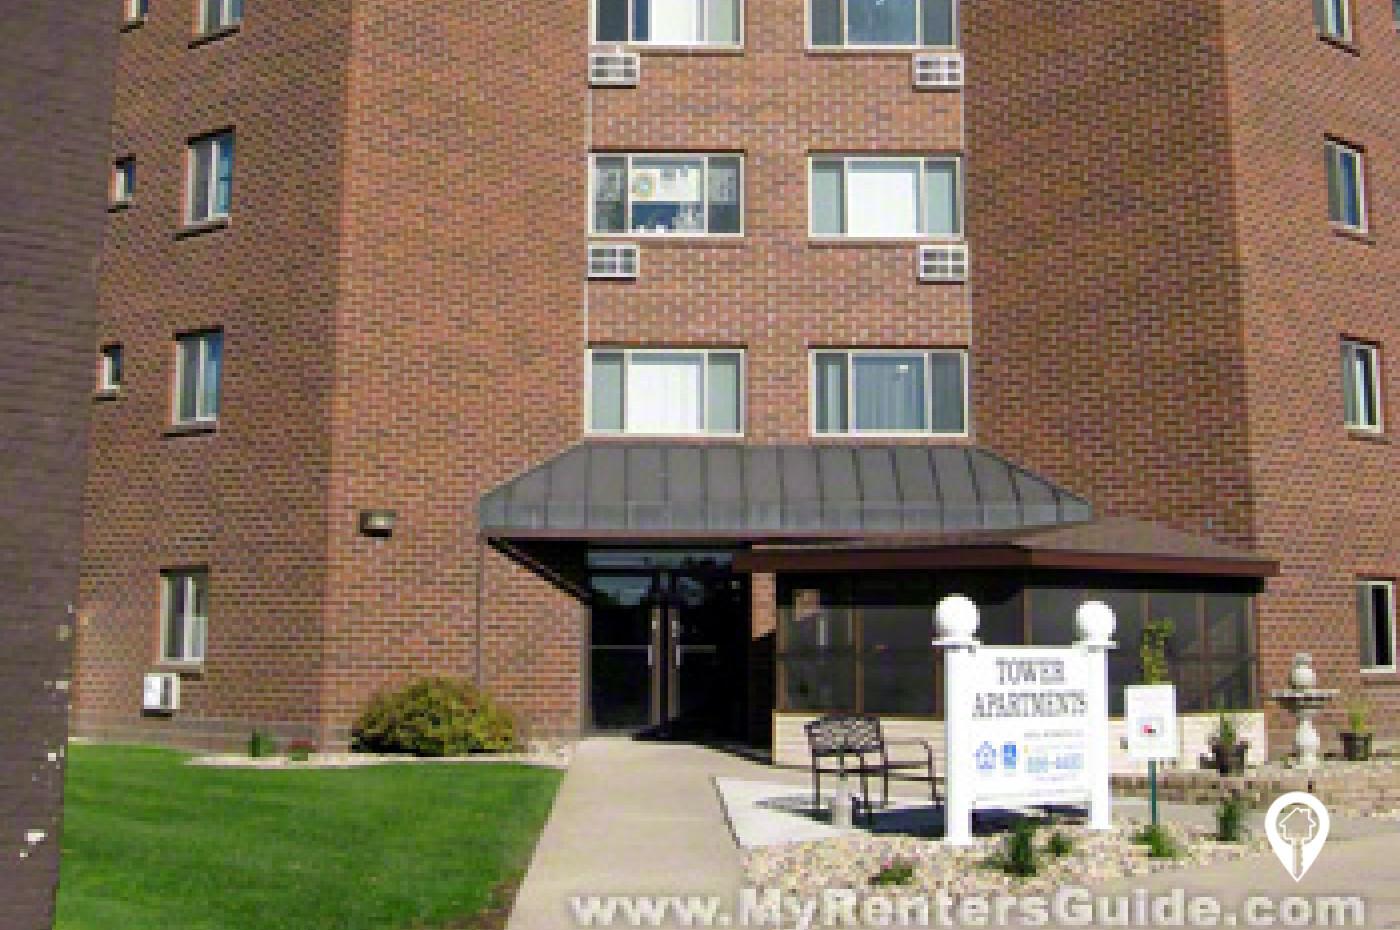 Monroe Group - Steel Tower Apartments